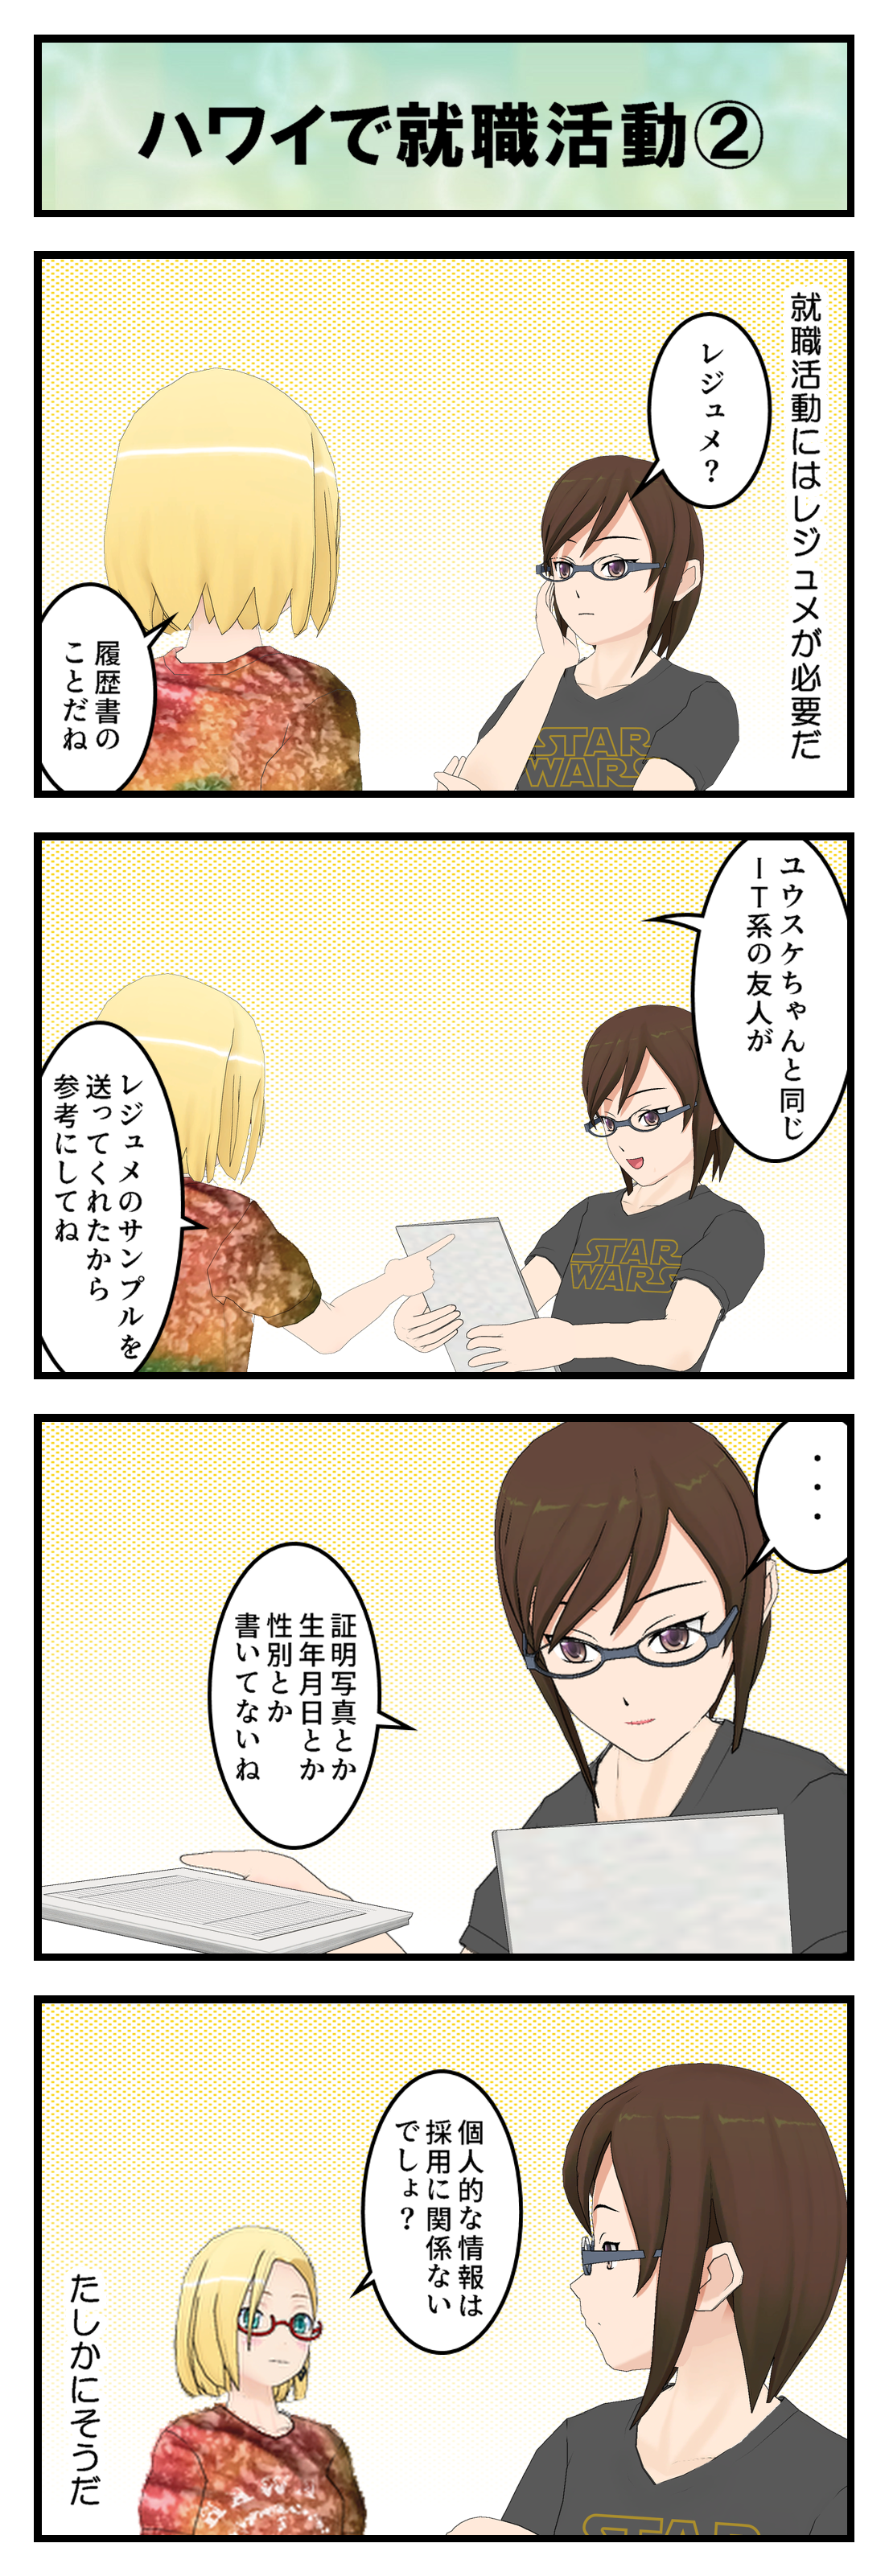 R401_就職活動のこと②レジュメ_001